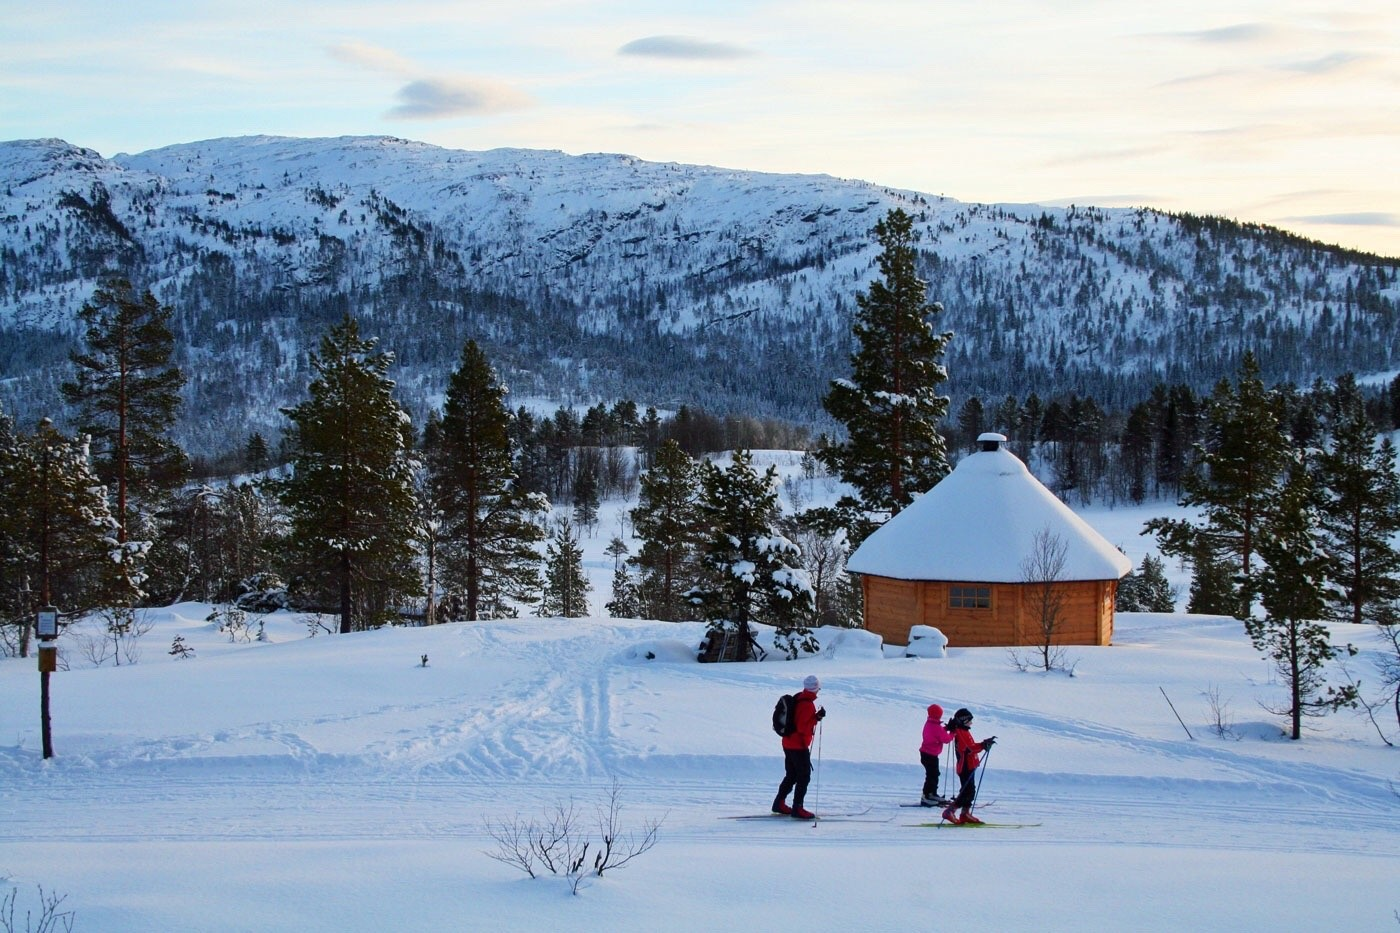 52/17 Søndagsturen: Skitur til grillhytta i Grønlifeltet